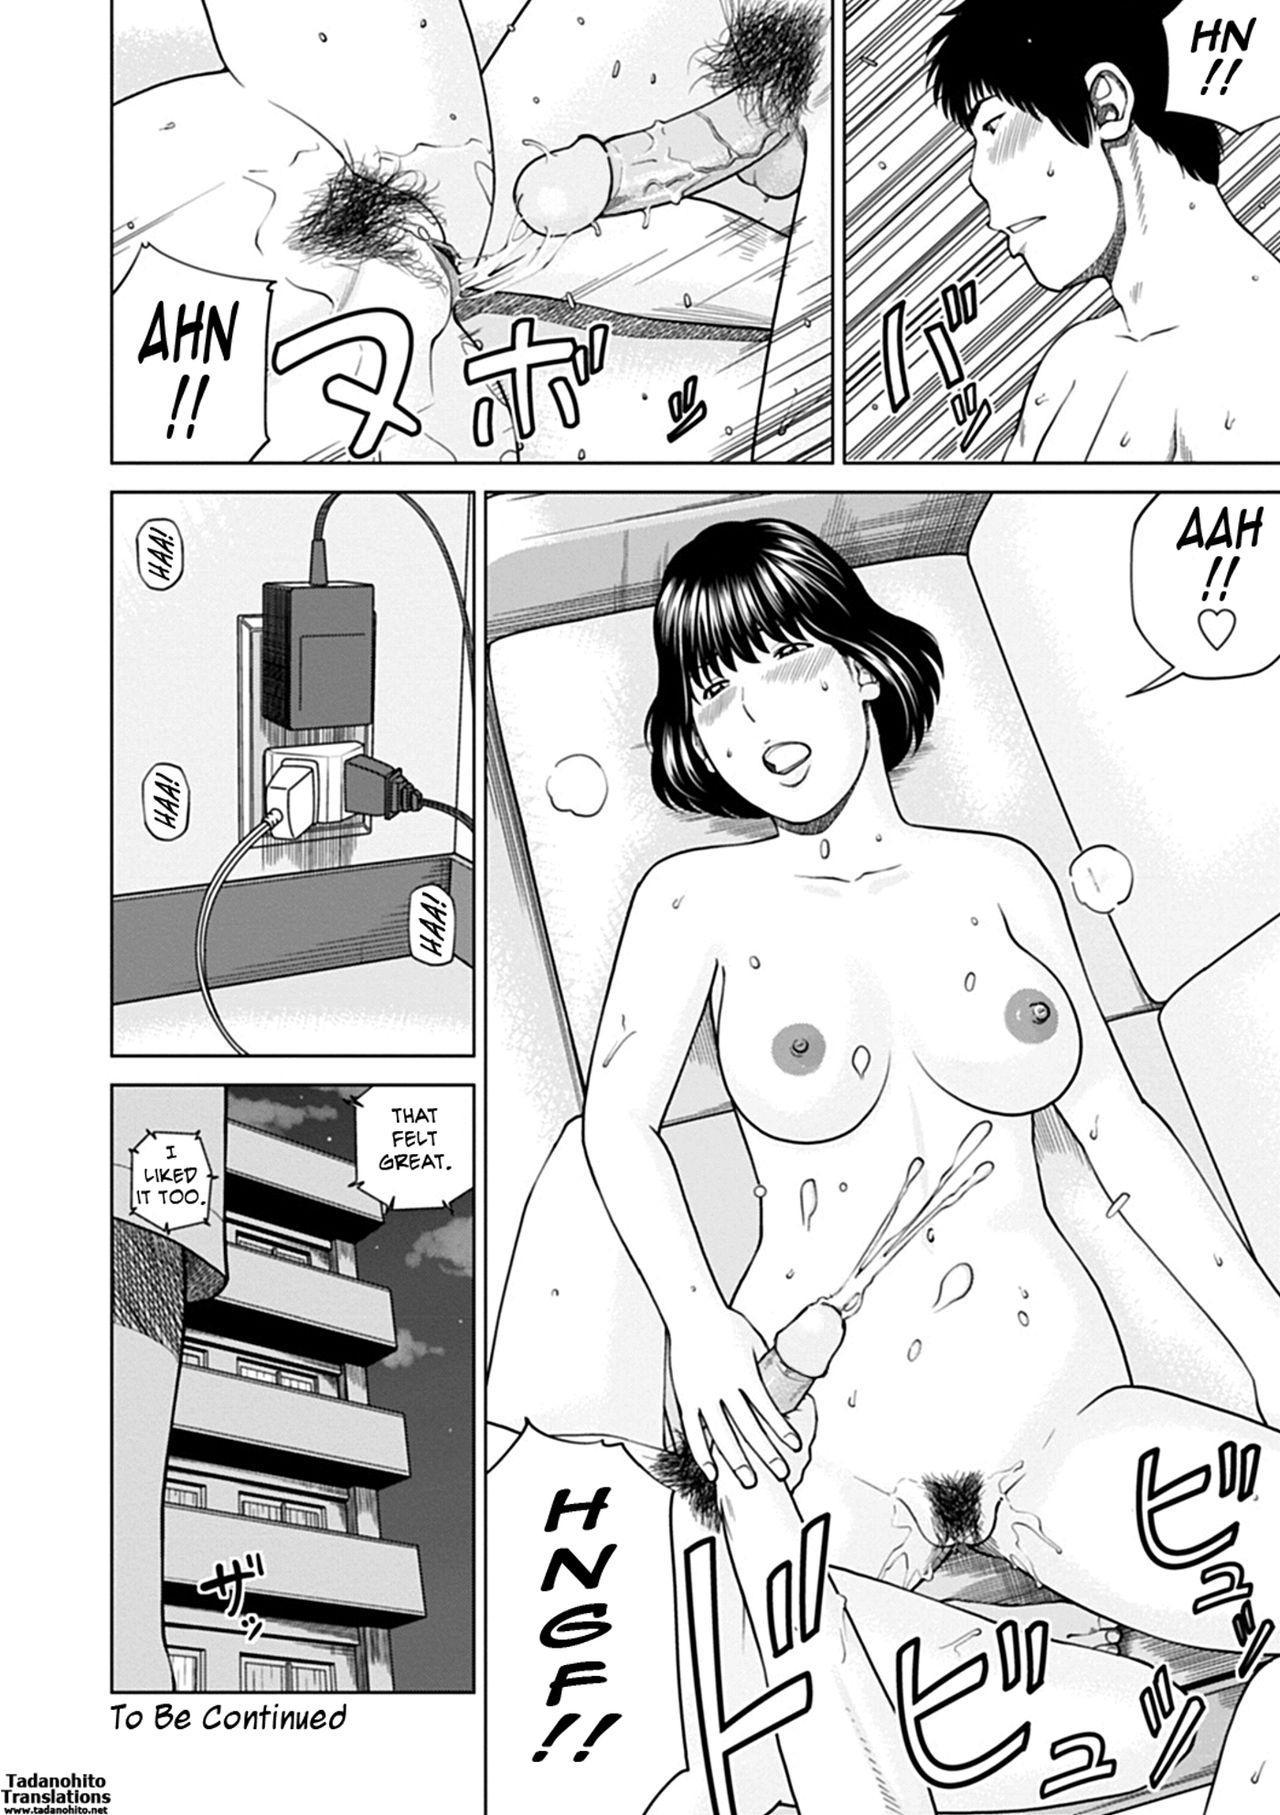 [Kuroki Hidehiko] 36-sai Injuku Sakarizuma | 36-Year-Old Randy Mature Wife [English] {Tadanohito} [Digital] [Uncensored] 134